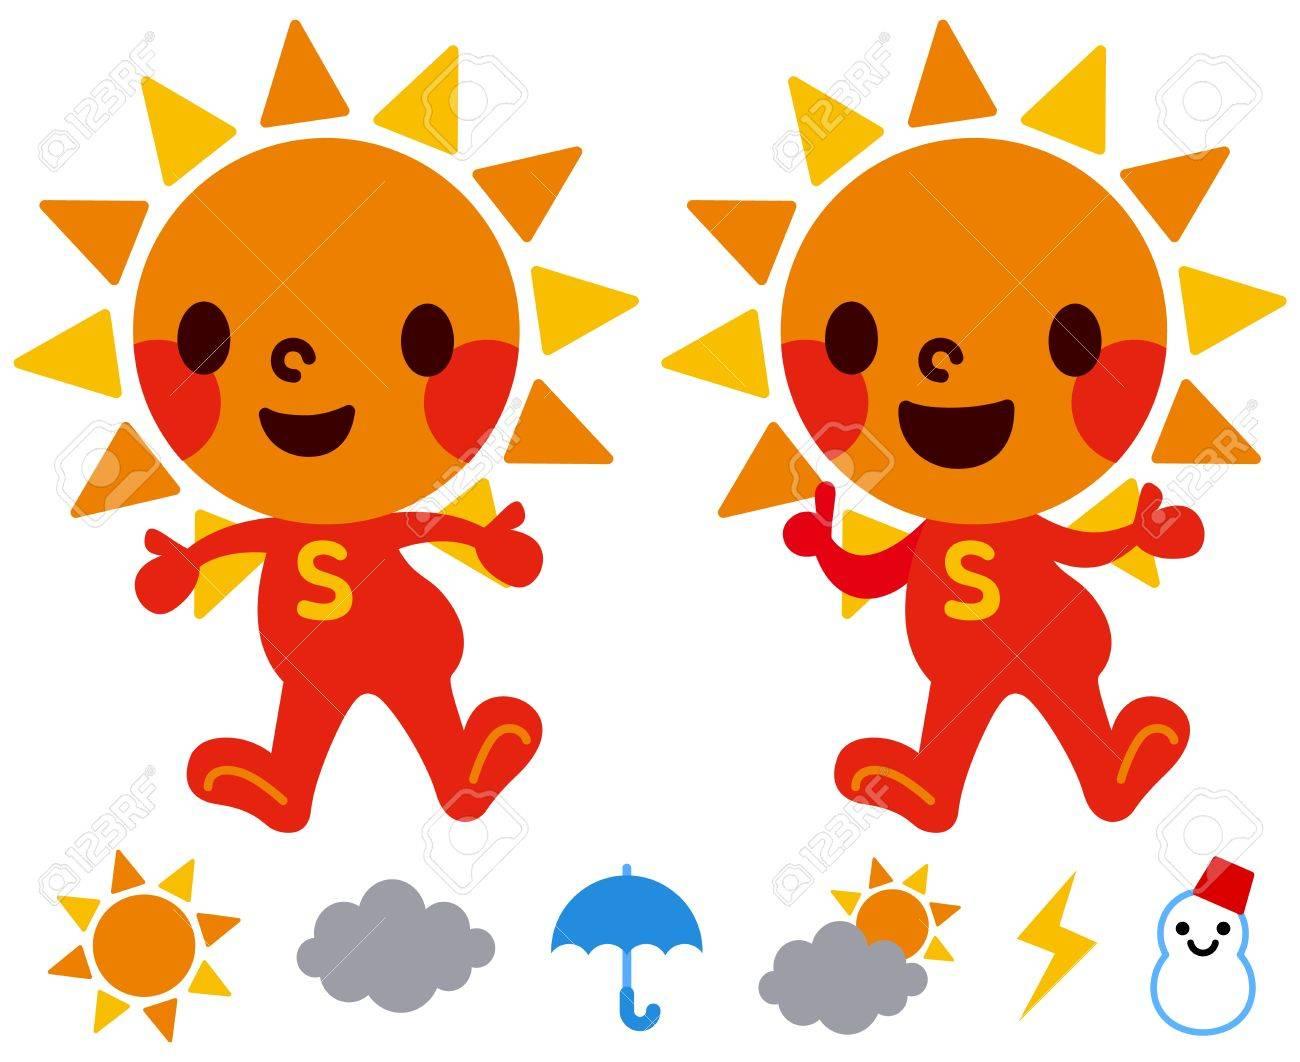 Sun s character Stock Vector - 18066238